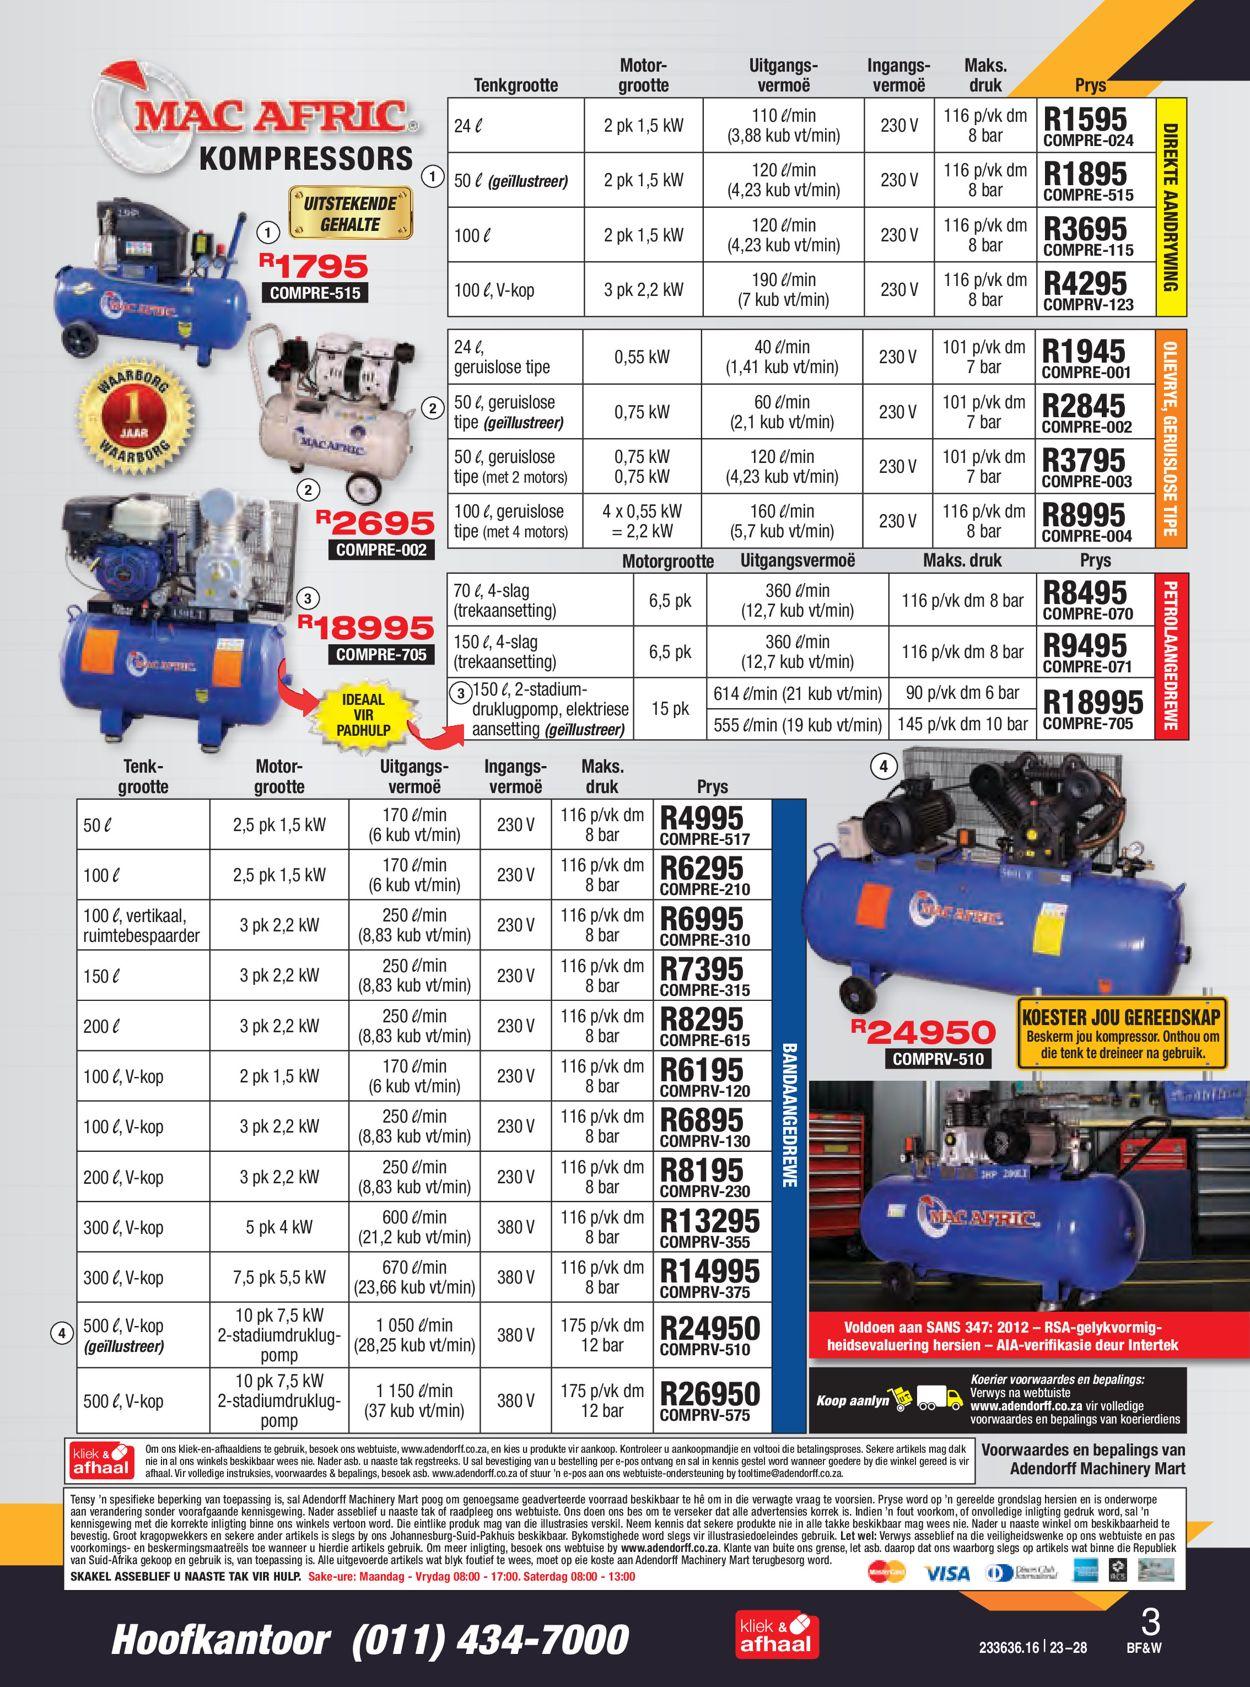 Adendorff Machinery Mart Black Friday 2020 Catalogue - 2020/11/23-2020/11/28 (Page 4)